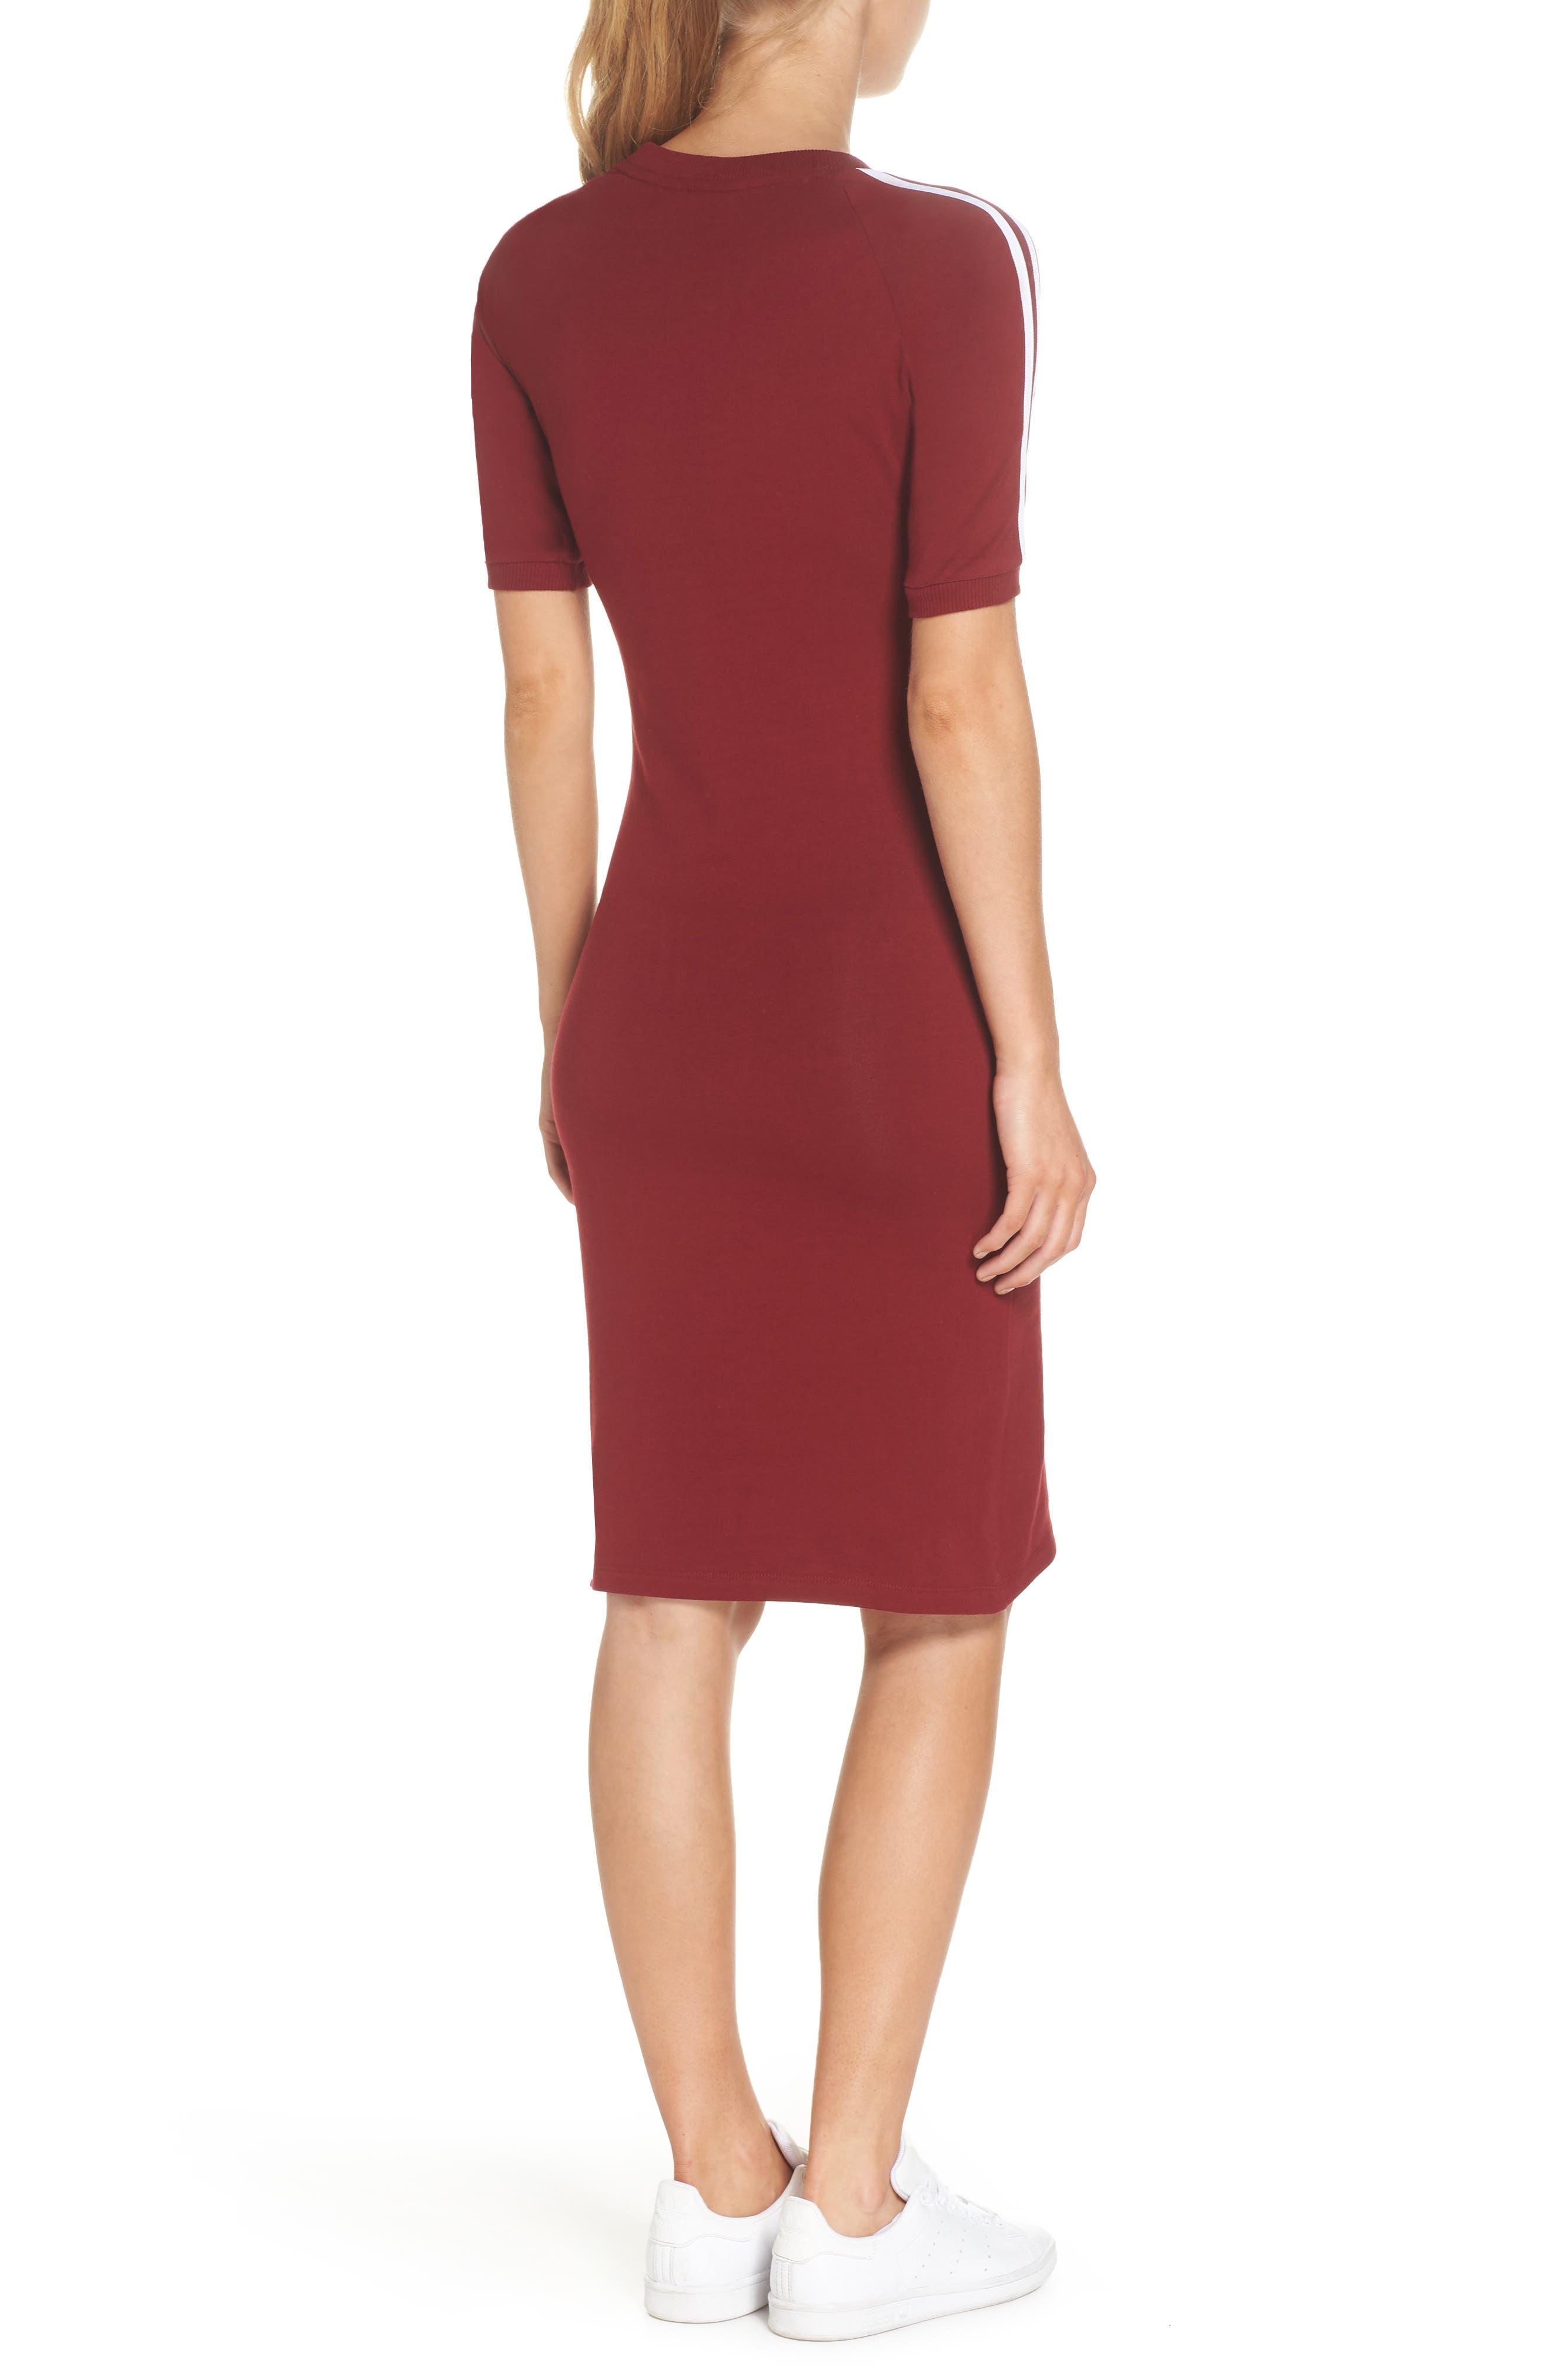 Originals 3-Stripes Dress,                             Alternate thumbnail 2, color,                             Collegiate Burgundy